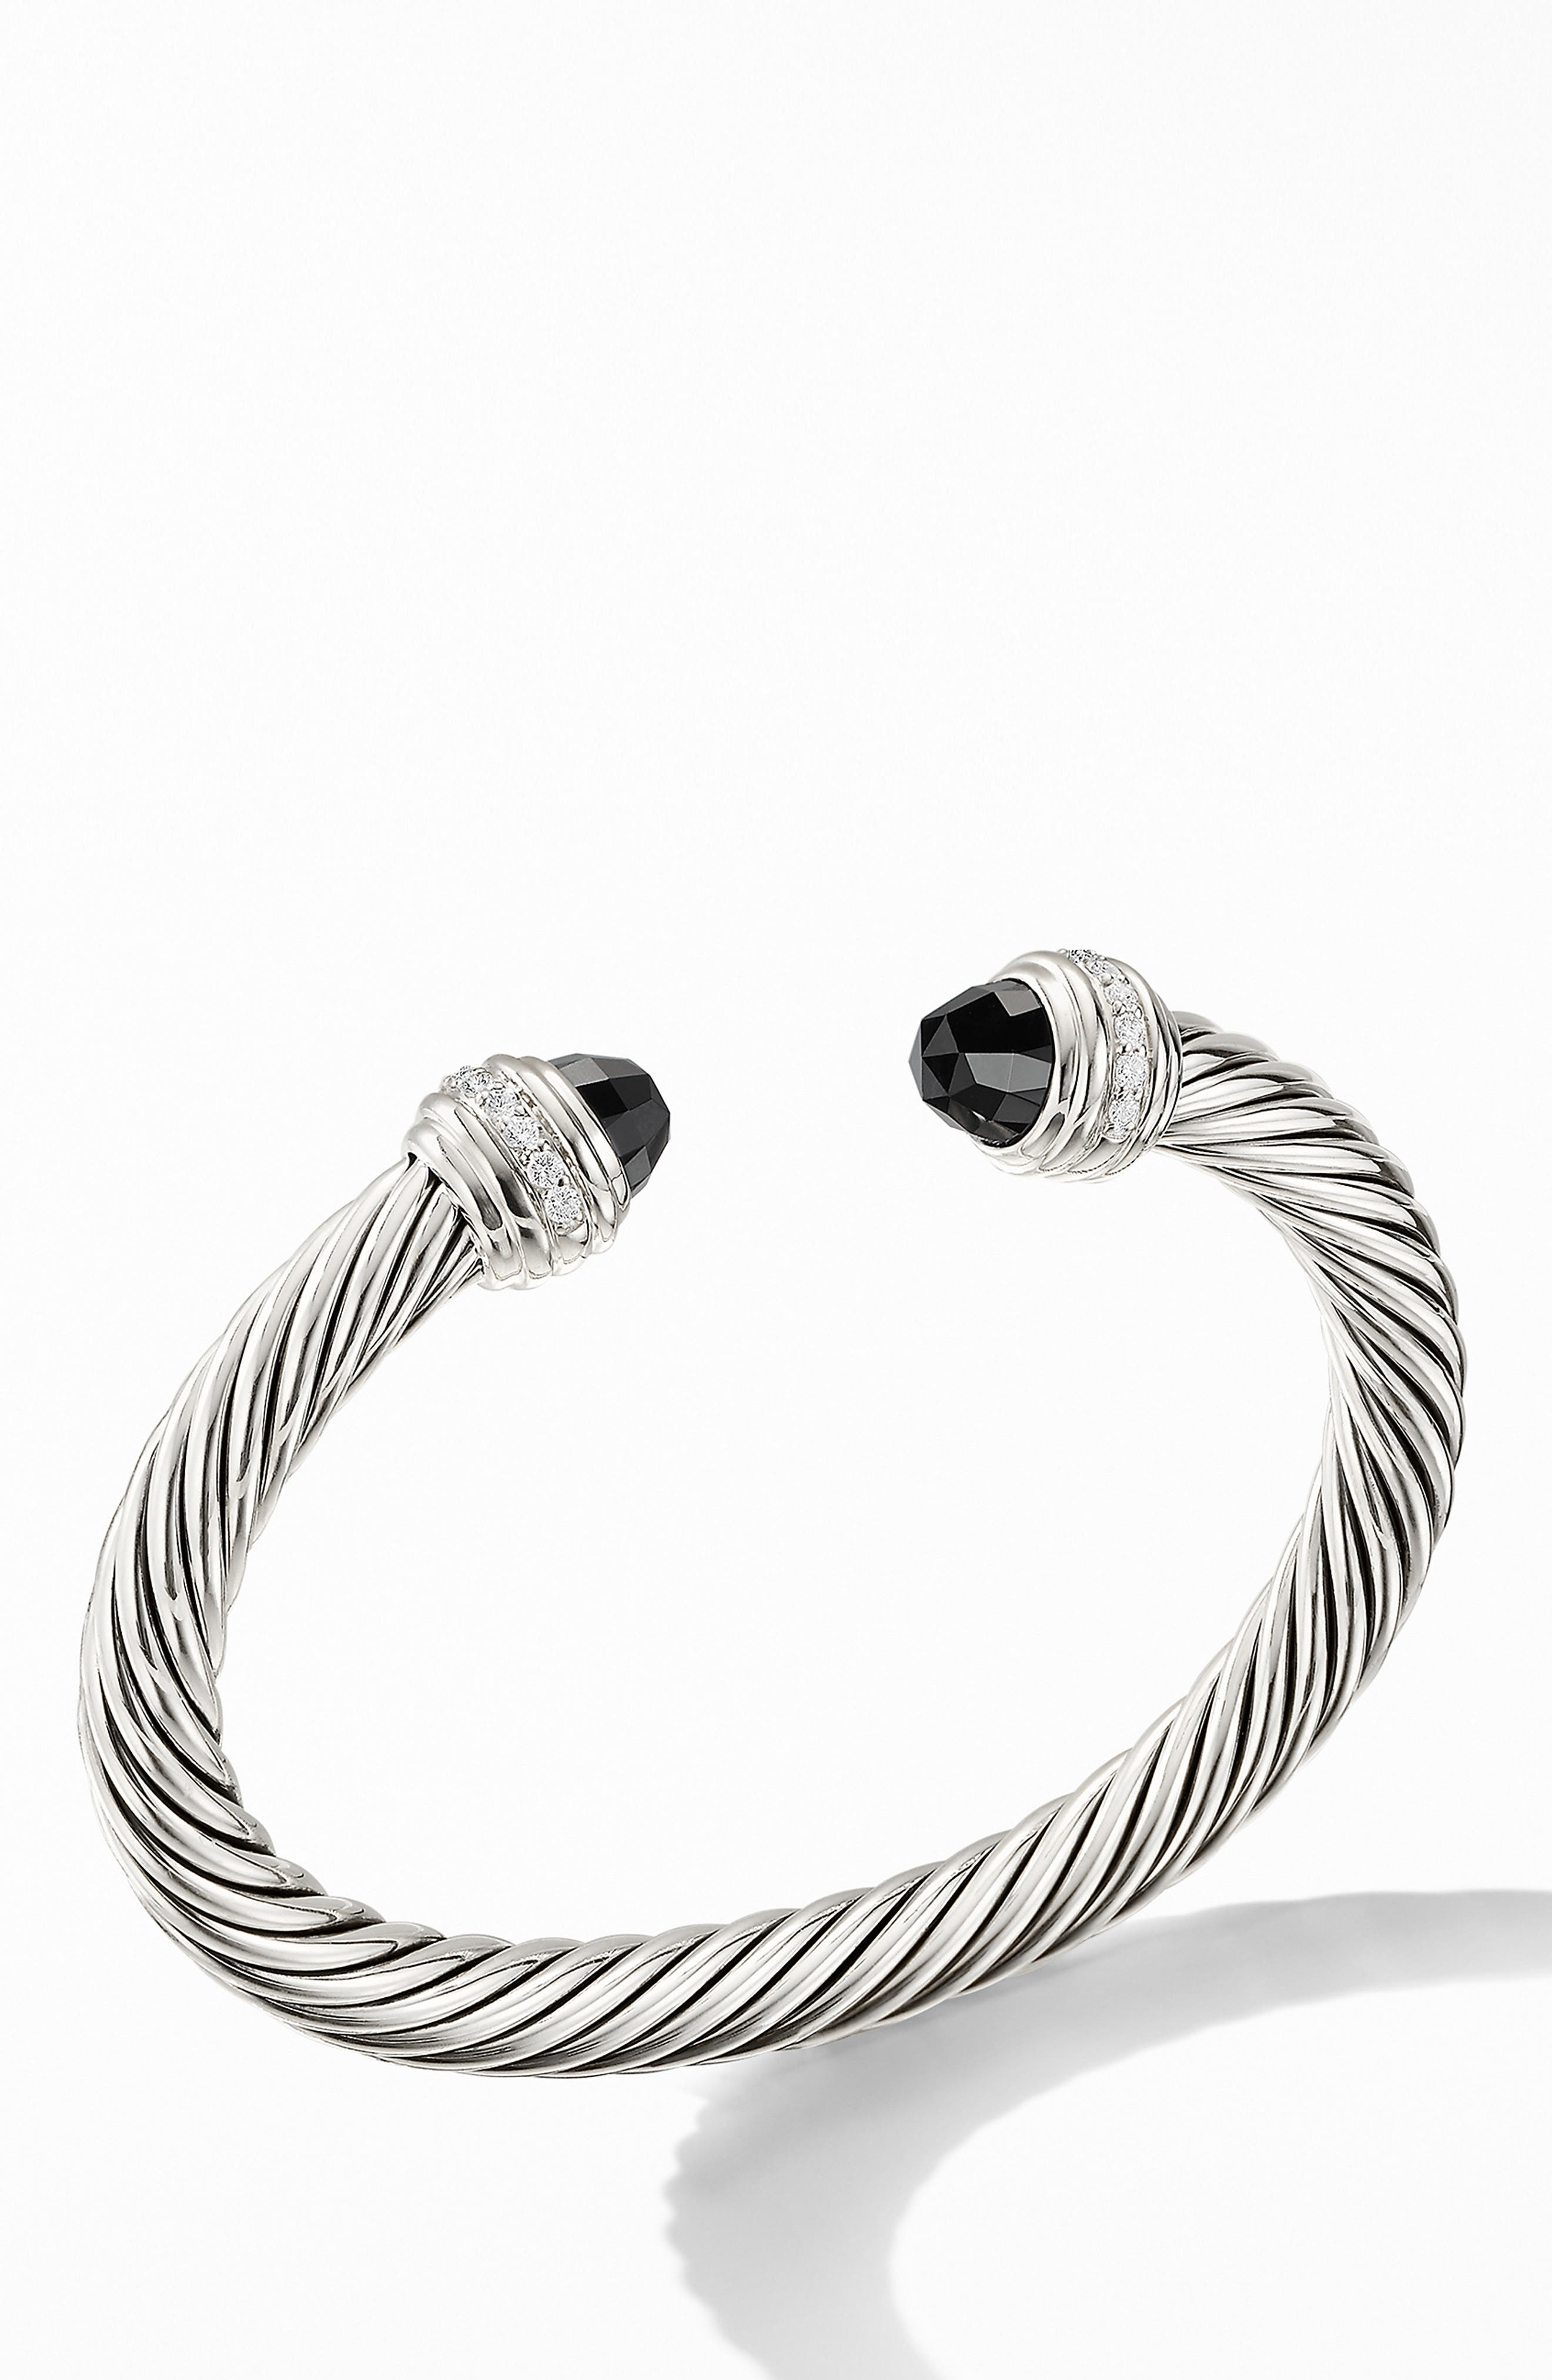 DAVID YURMAN Cable Classics Bracelet with Semiprecious Stones & Diamonds, 7mm, Main, color, SILVER/ DIAMOND/ BLACK ONYX